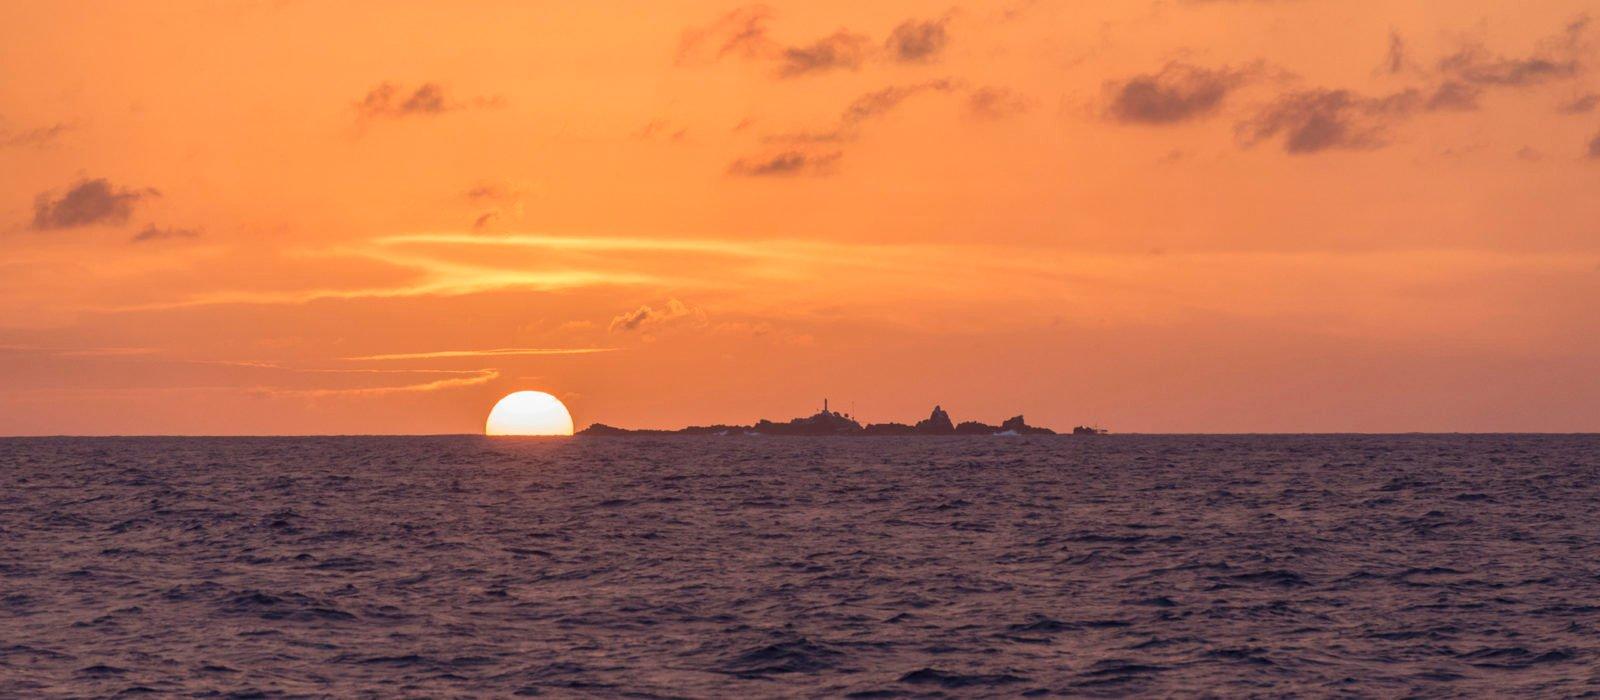 sao-paulo-brazil-sunset